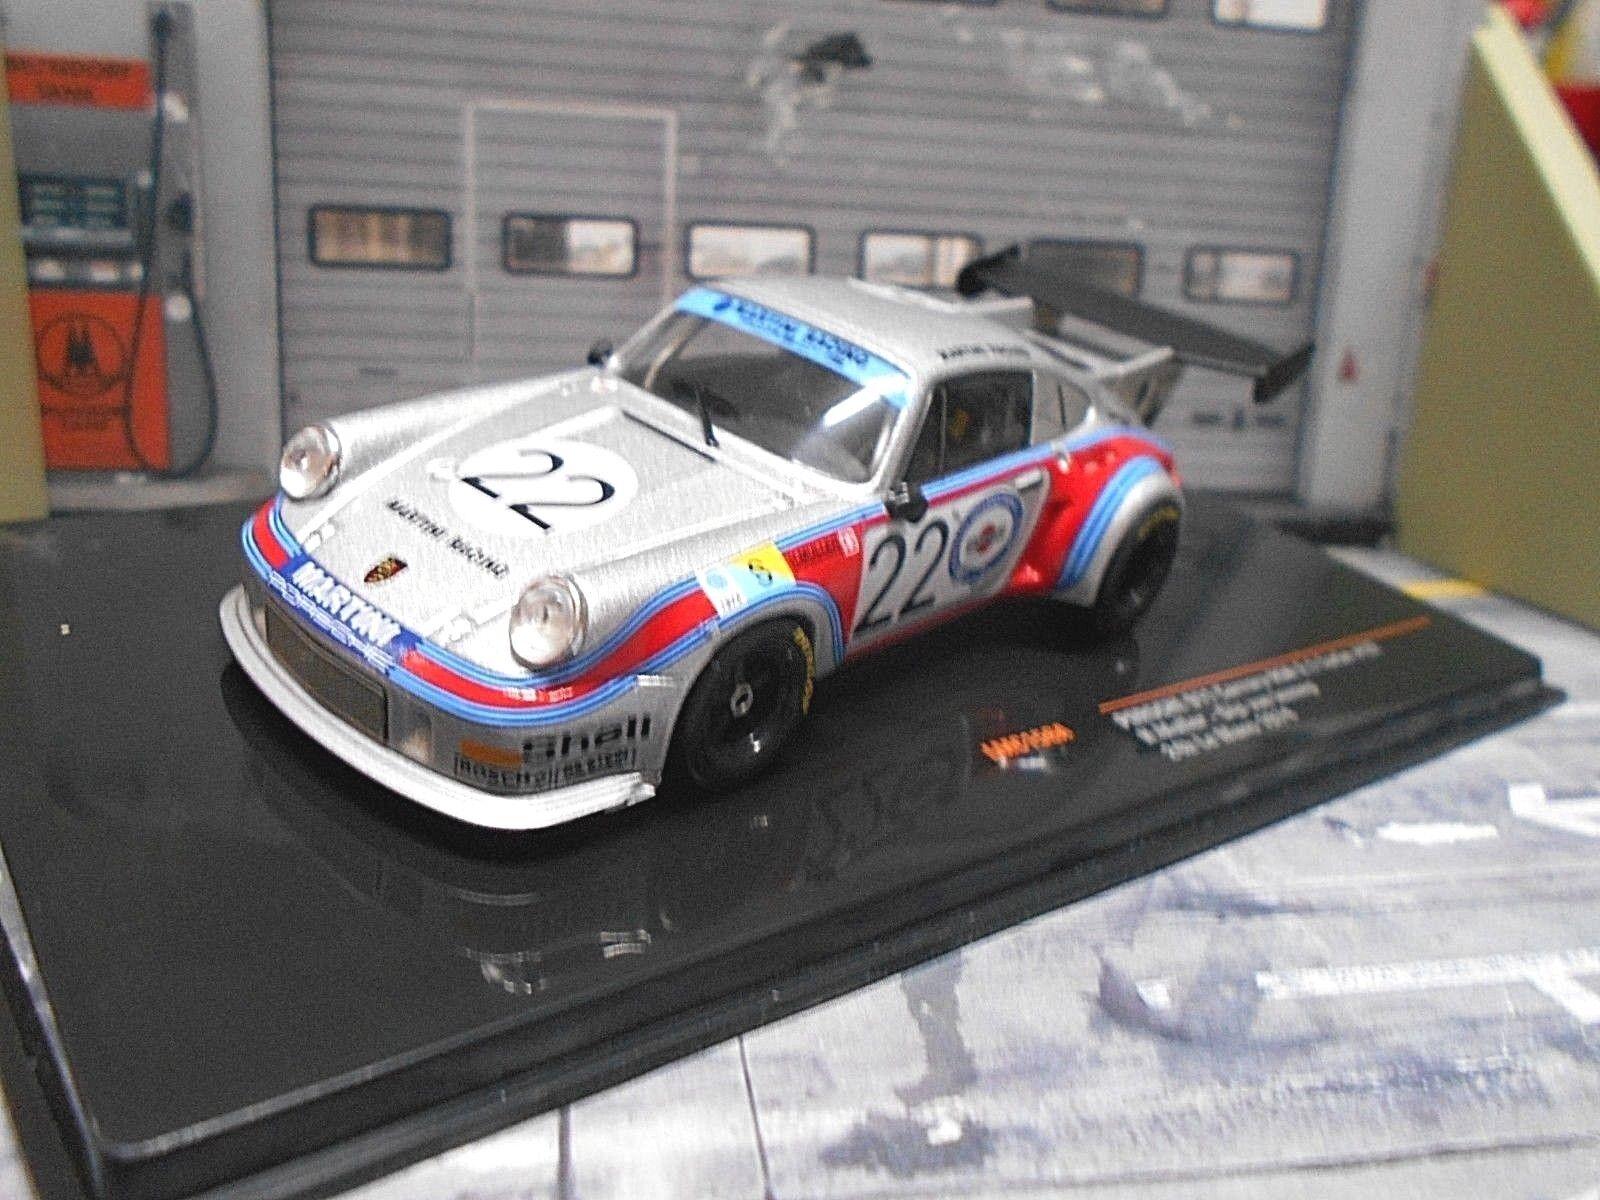 PORSCHE PORSCHE PORSCHE 911 Carrera 2.1 RSR Turbo Le Mans 1974  22 Müller Lennep Martini I 1 43  | Sale Düsseldorf  56efb3